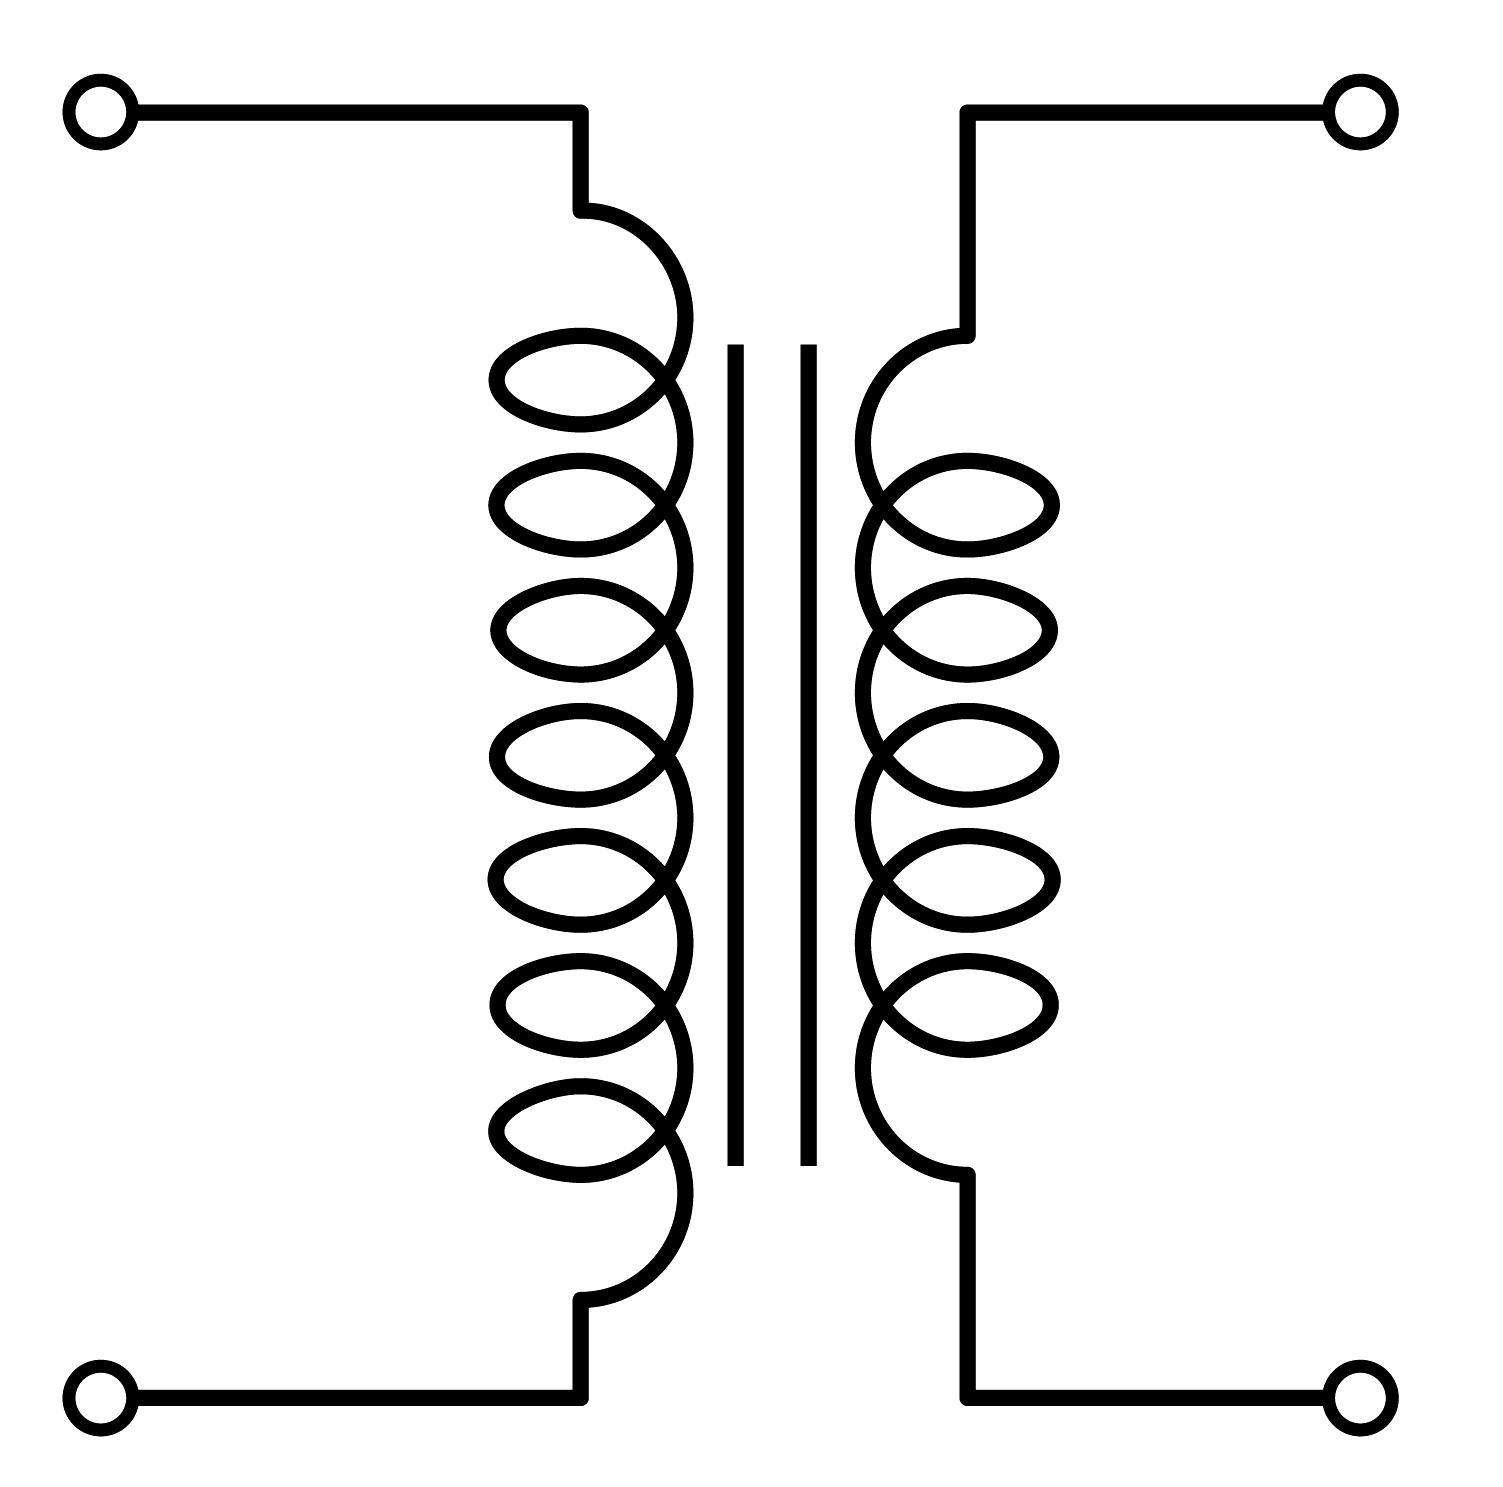 dc supply symbol